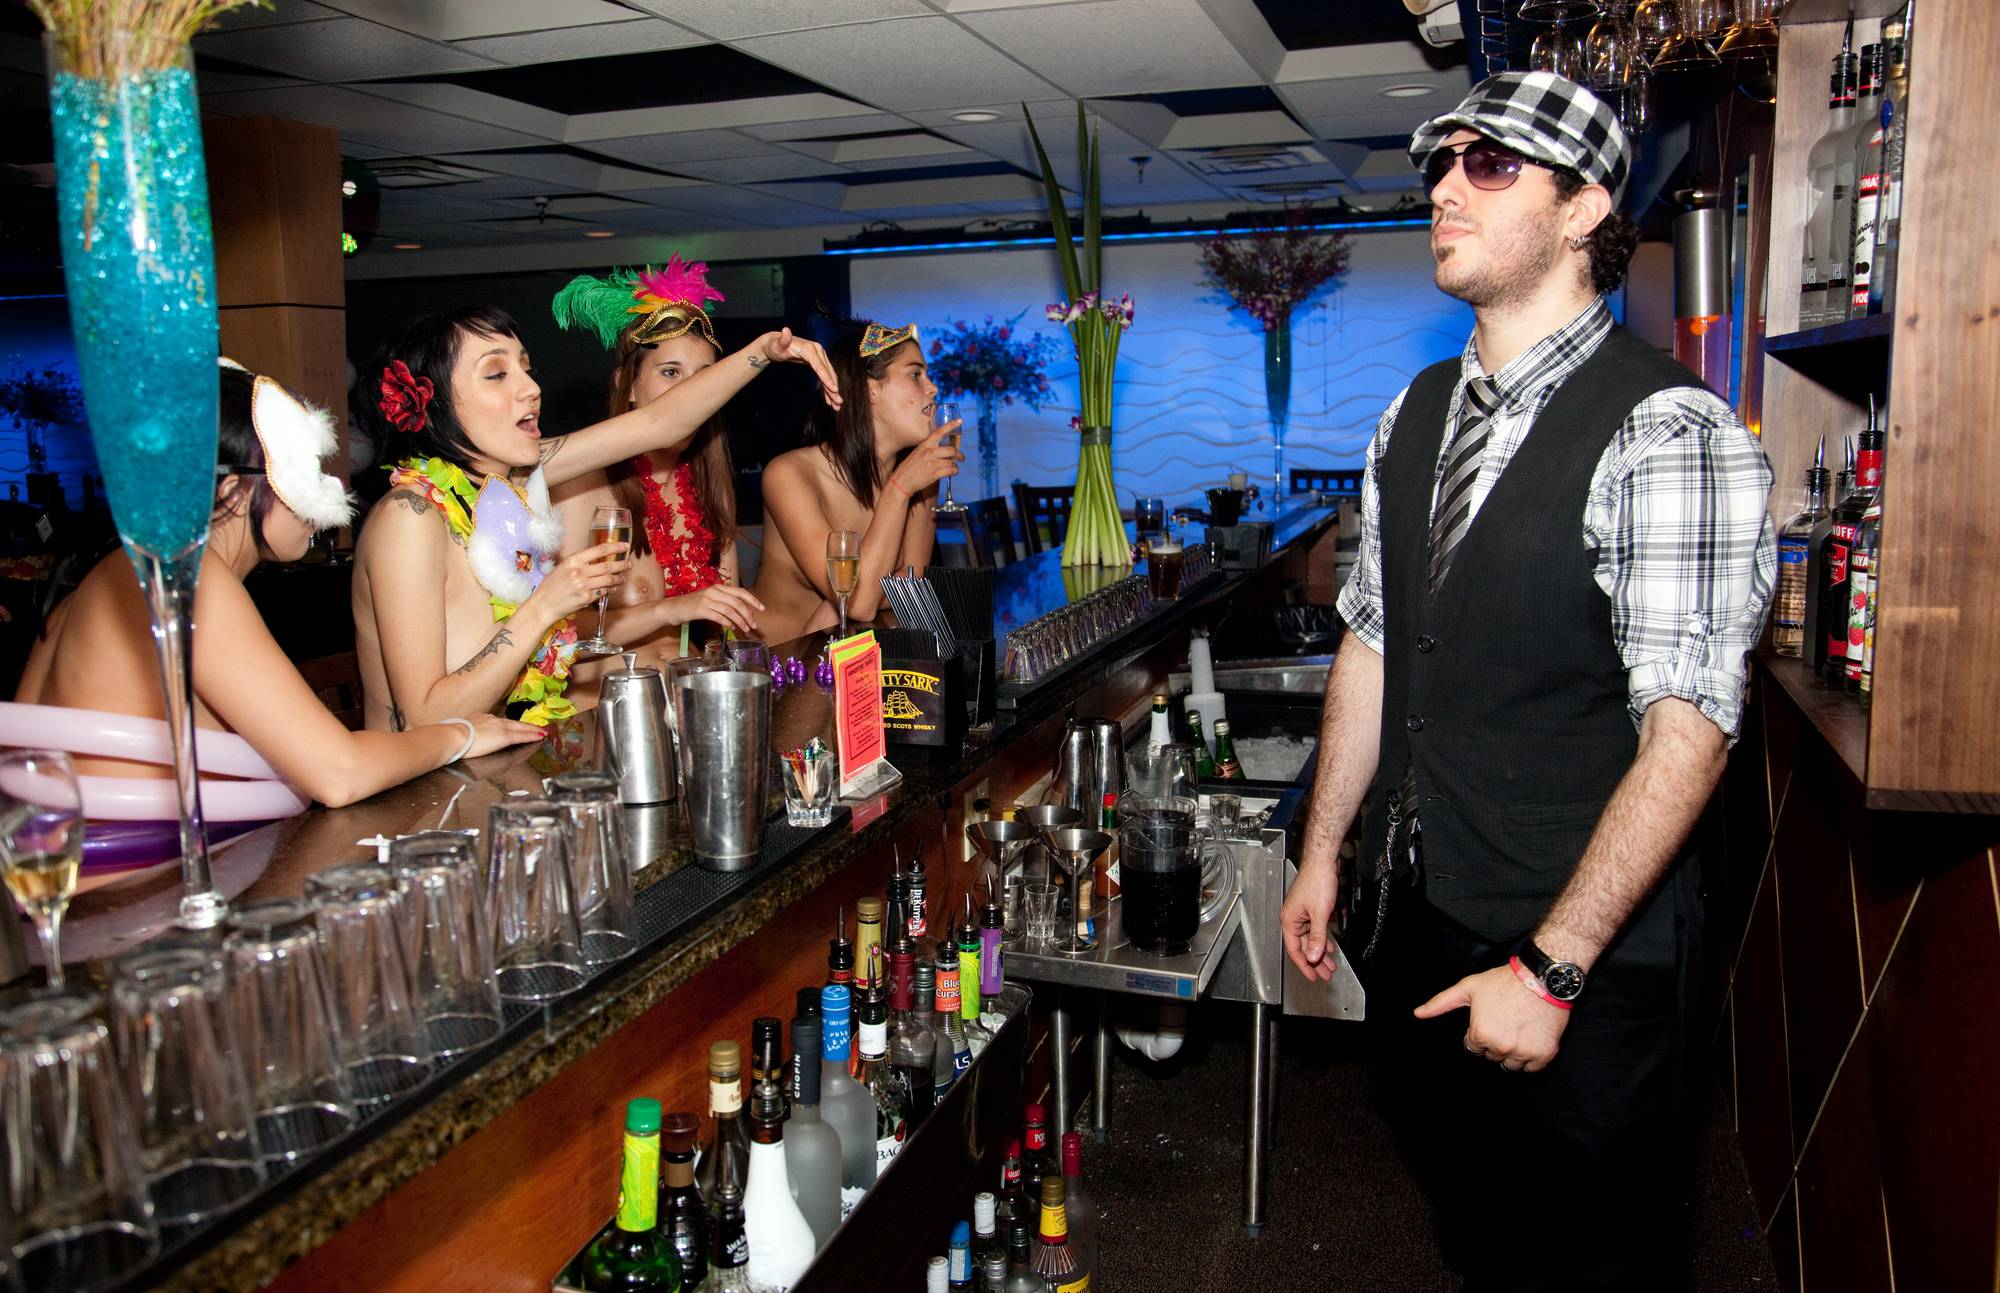 Masquerade Bar Scene - 2